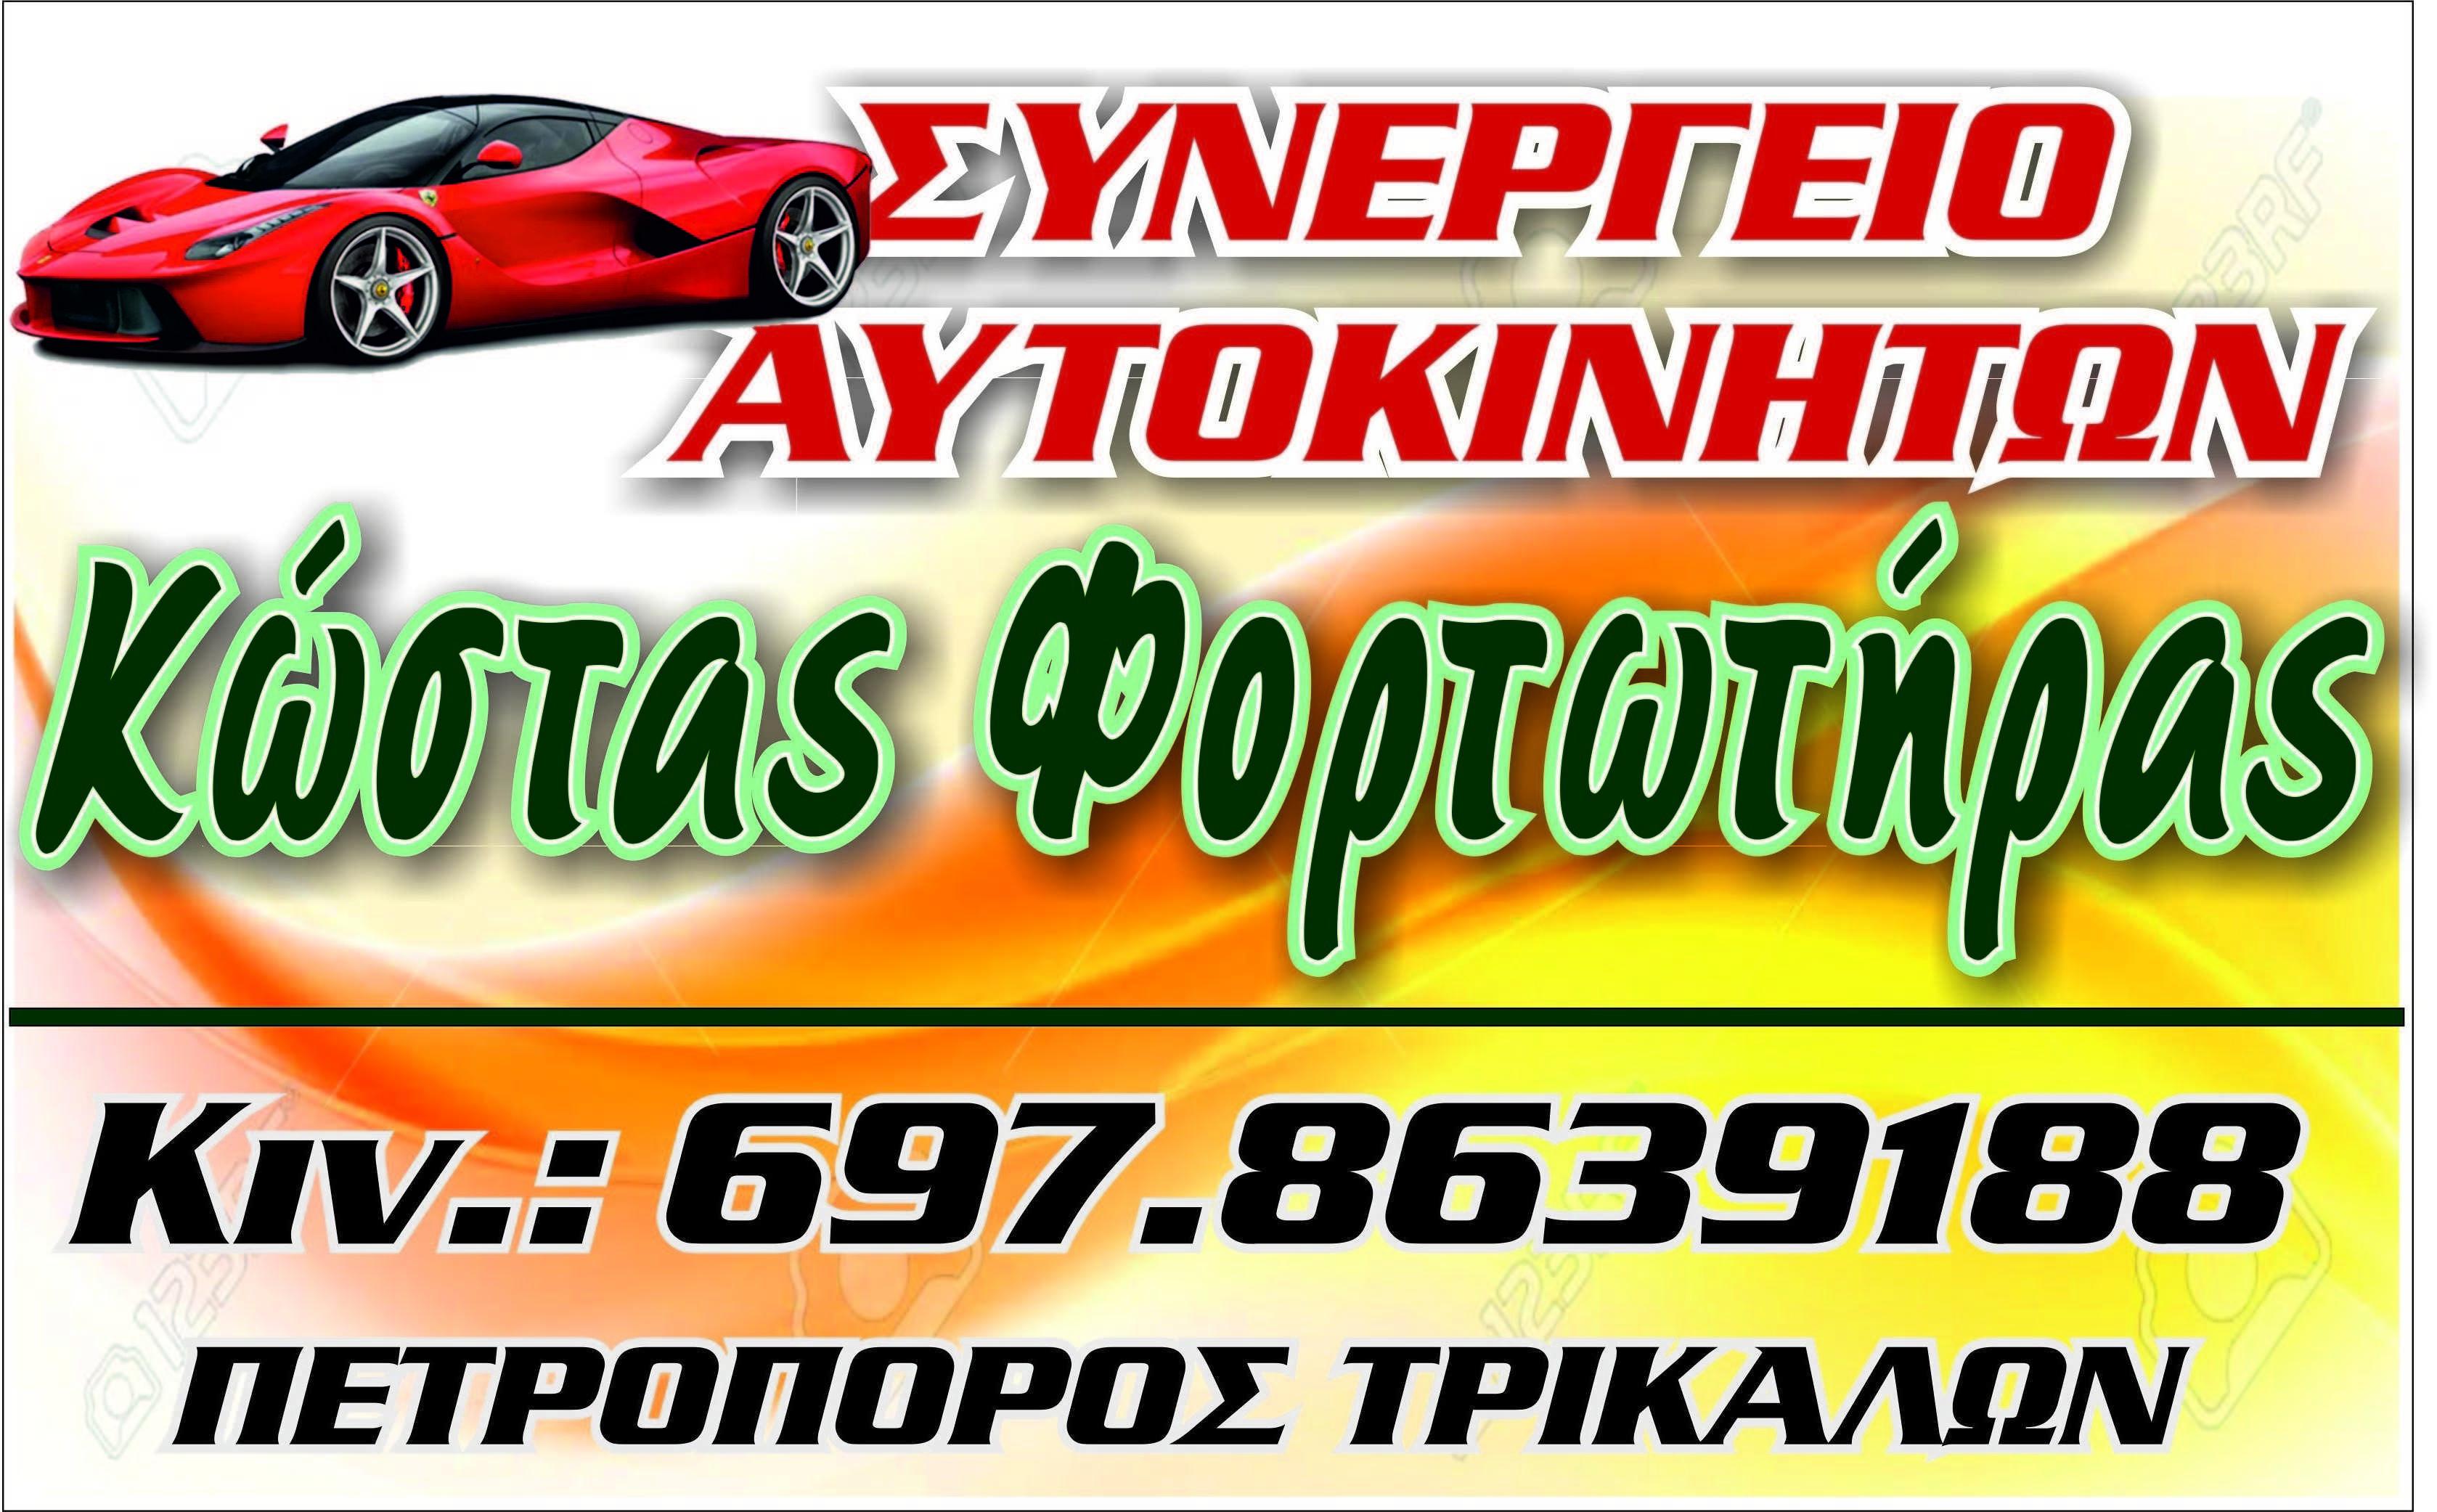 Fortotiras